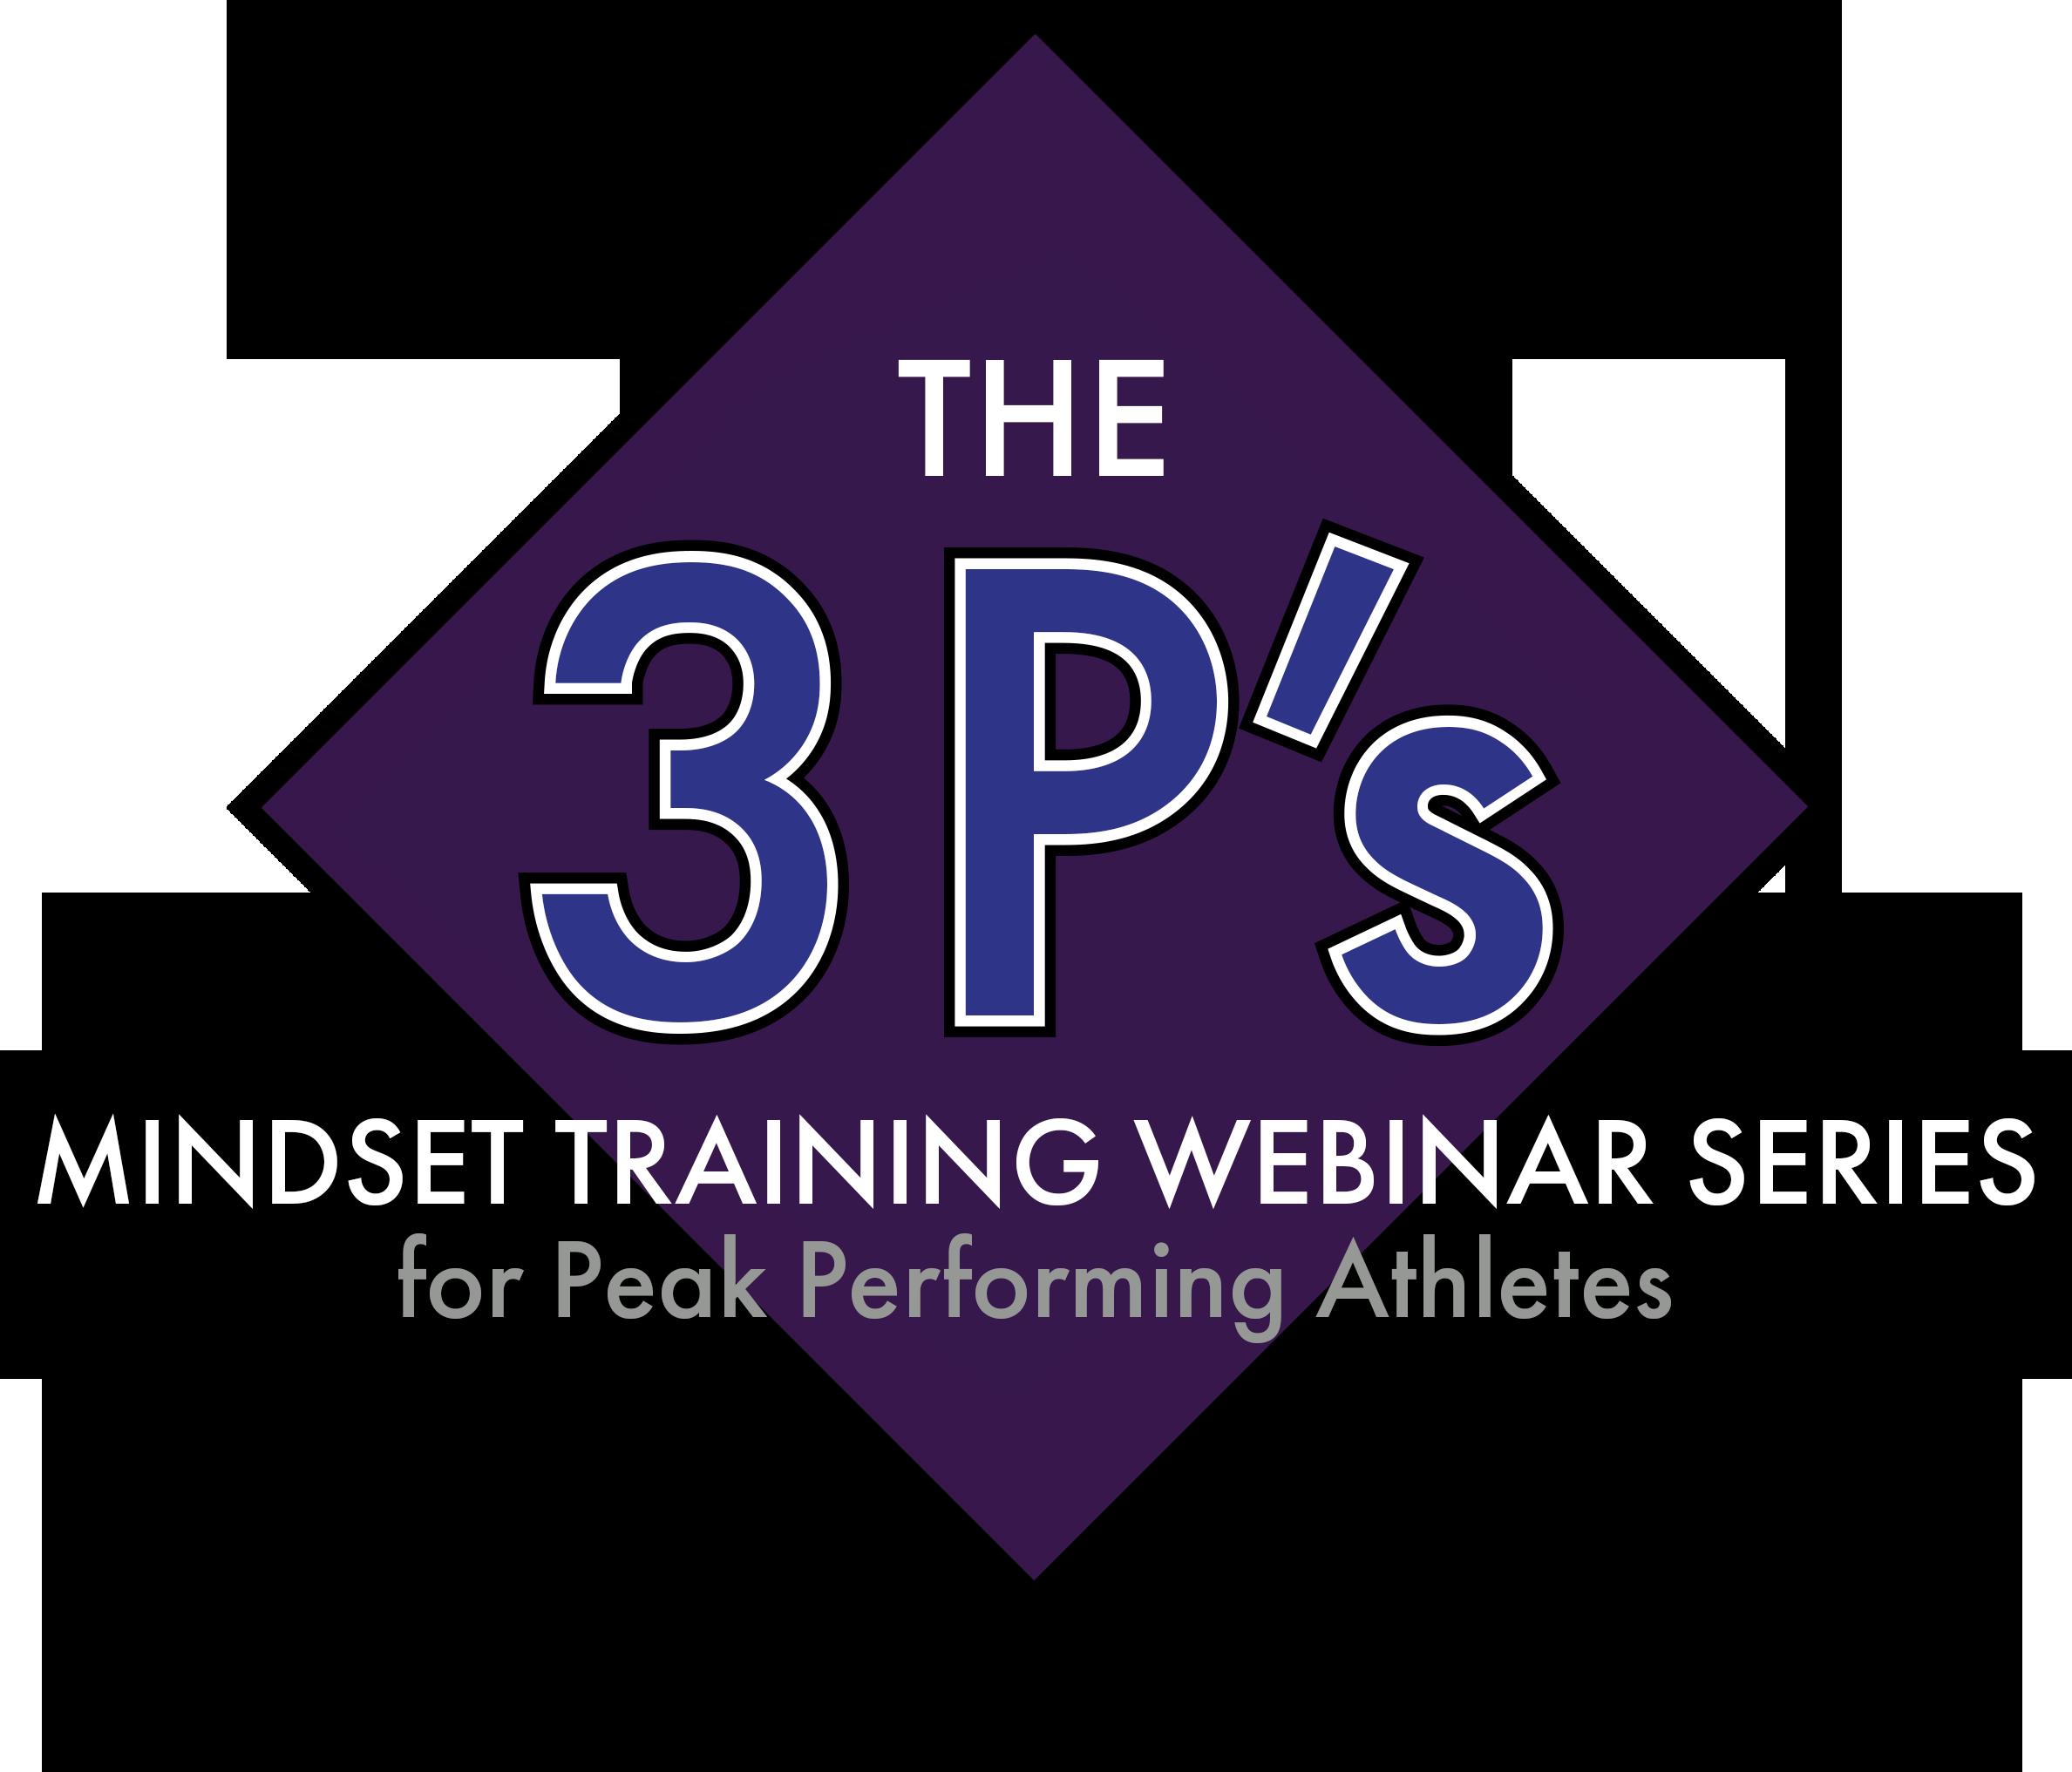 The 3 P's Mindset Training Webinar Series for Peak Performing Athletes